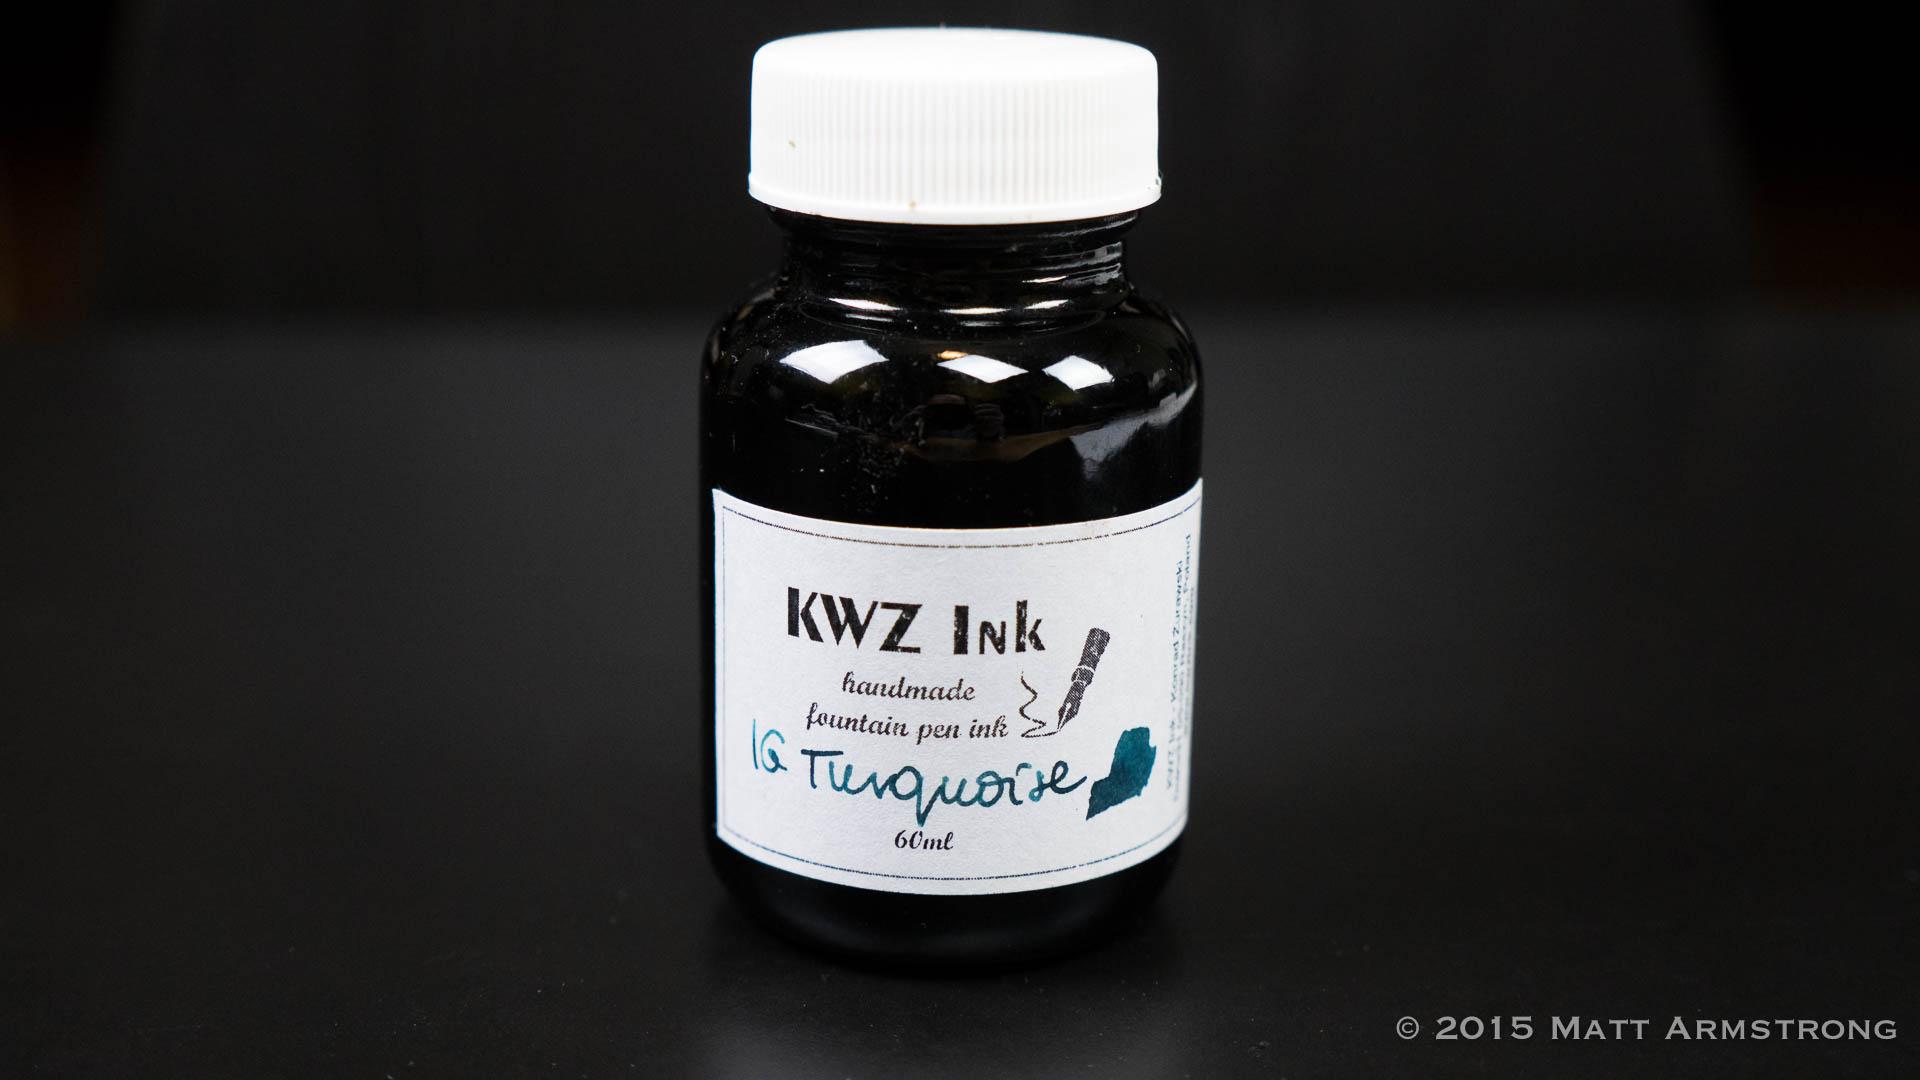 Ink Spot: KWZ Iron Gall Turquoise